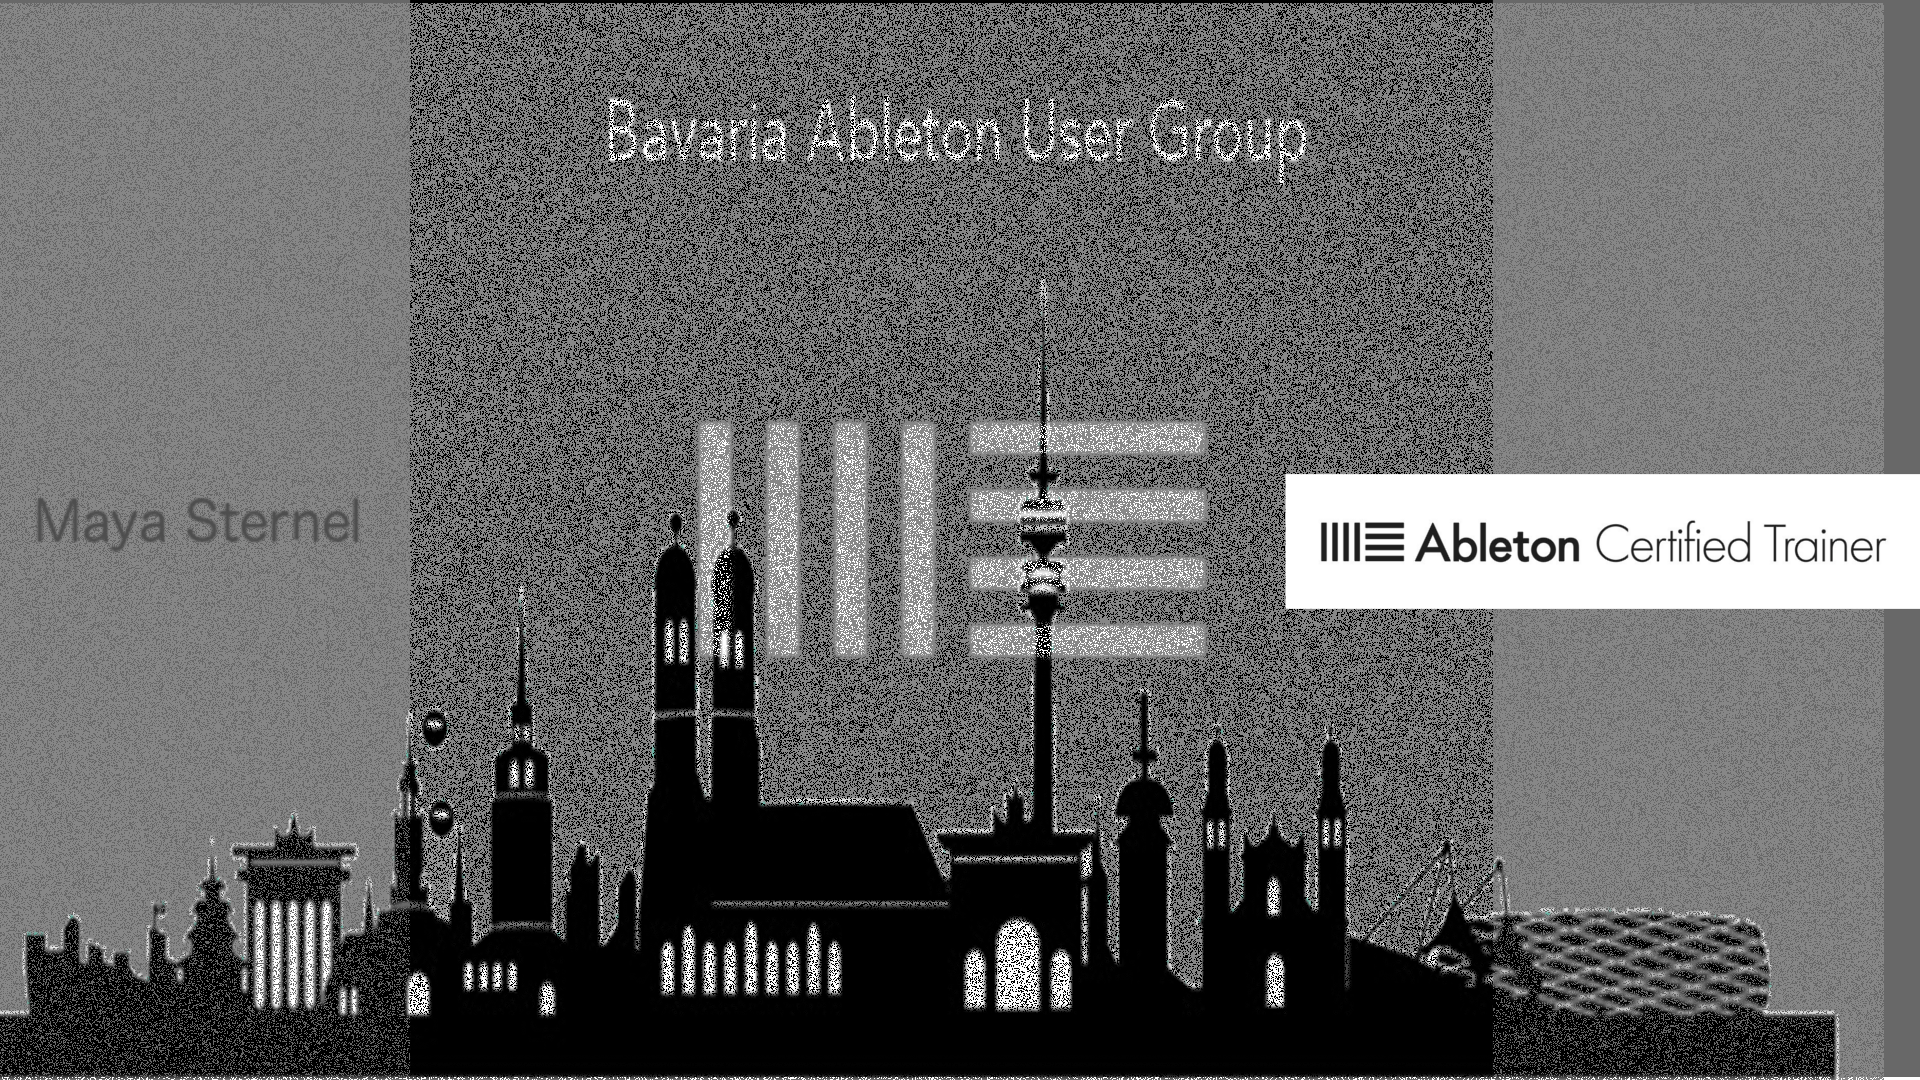 Bavaria Ableton Usergroup - Maya Sternel (Abl